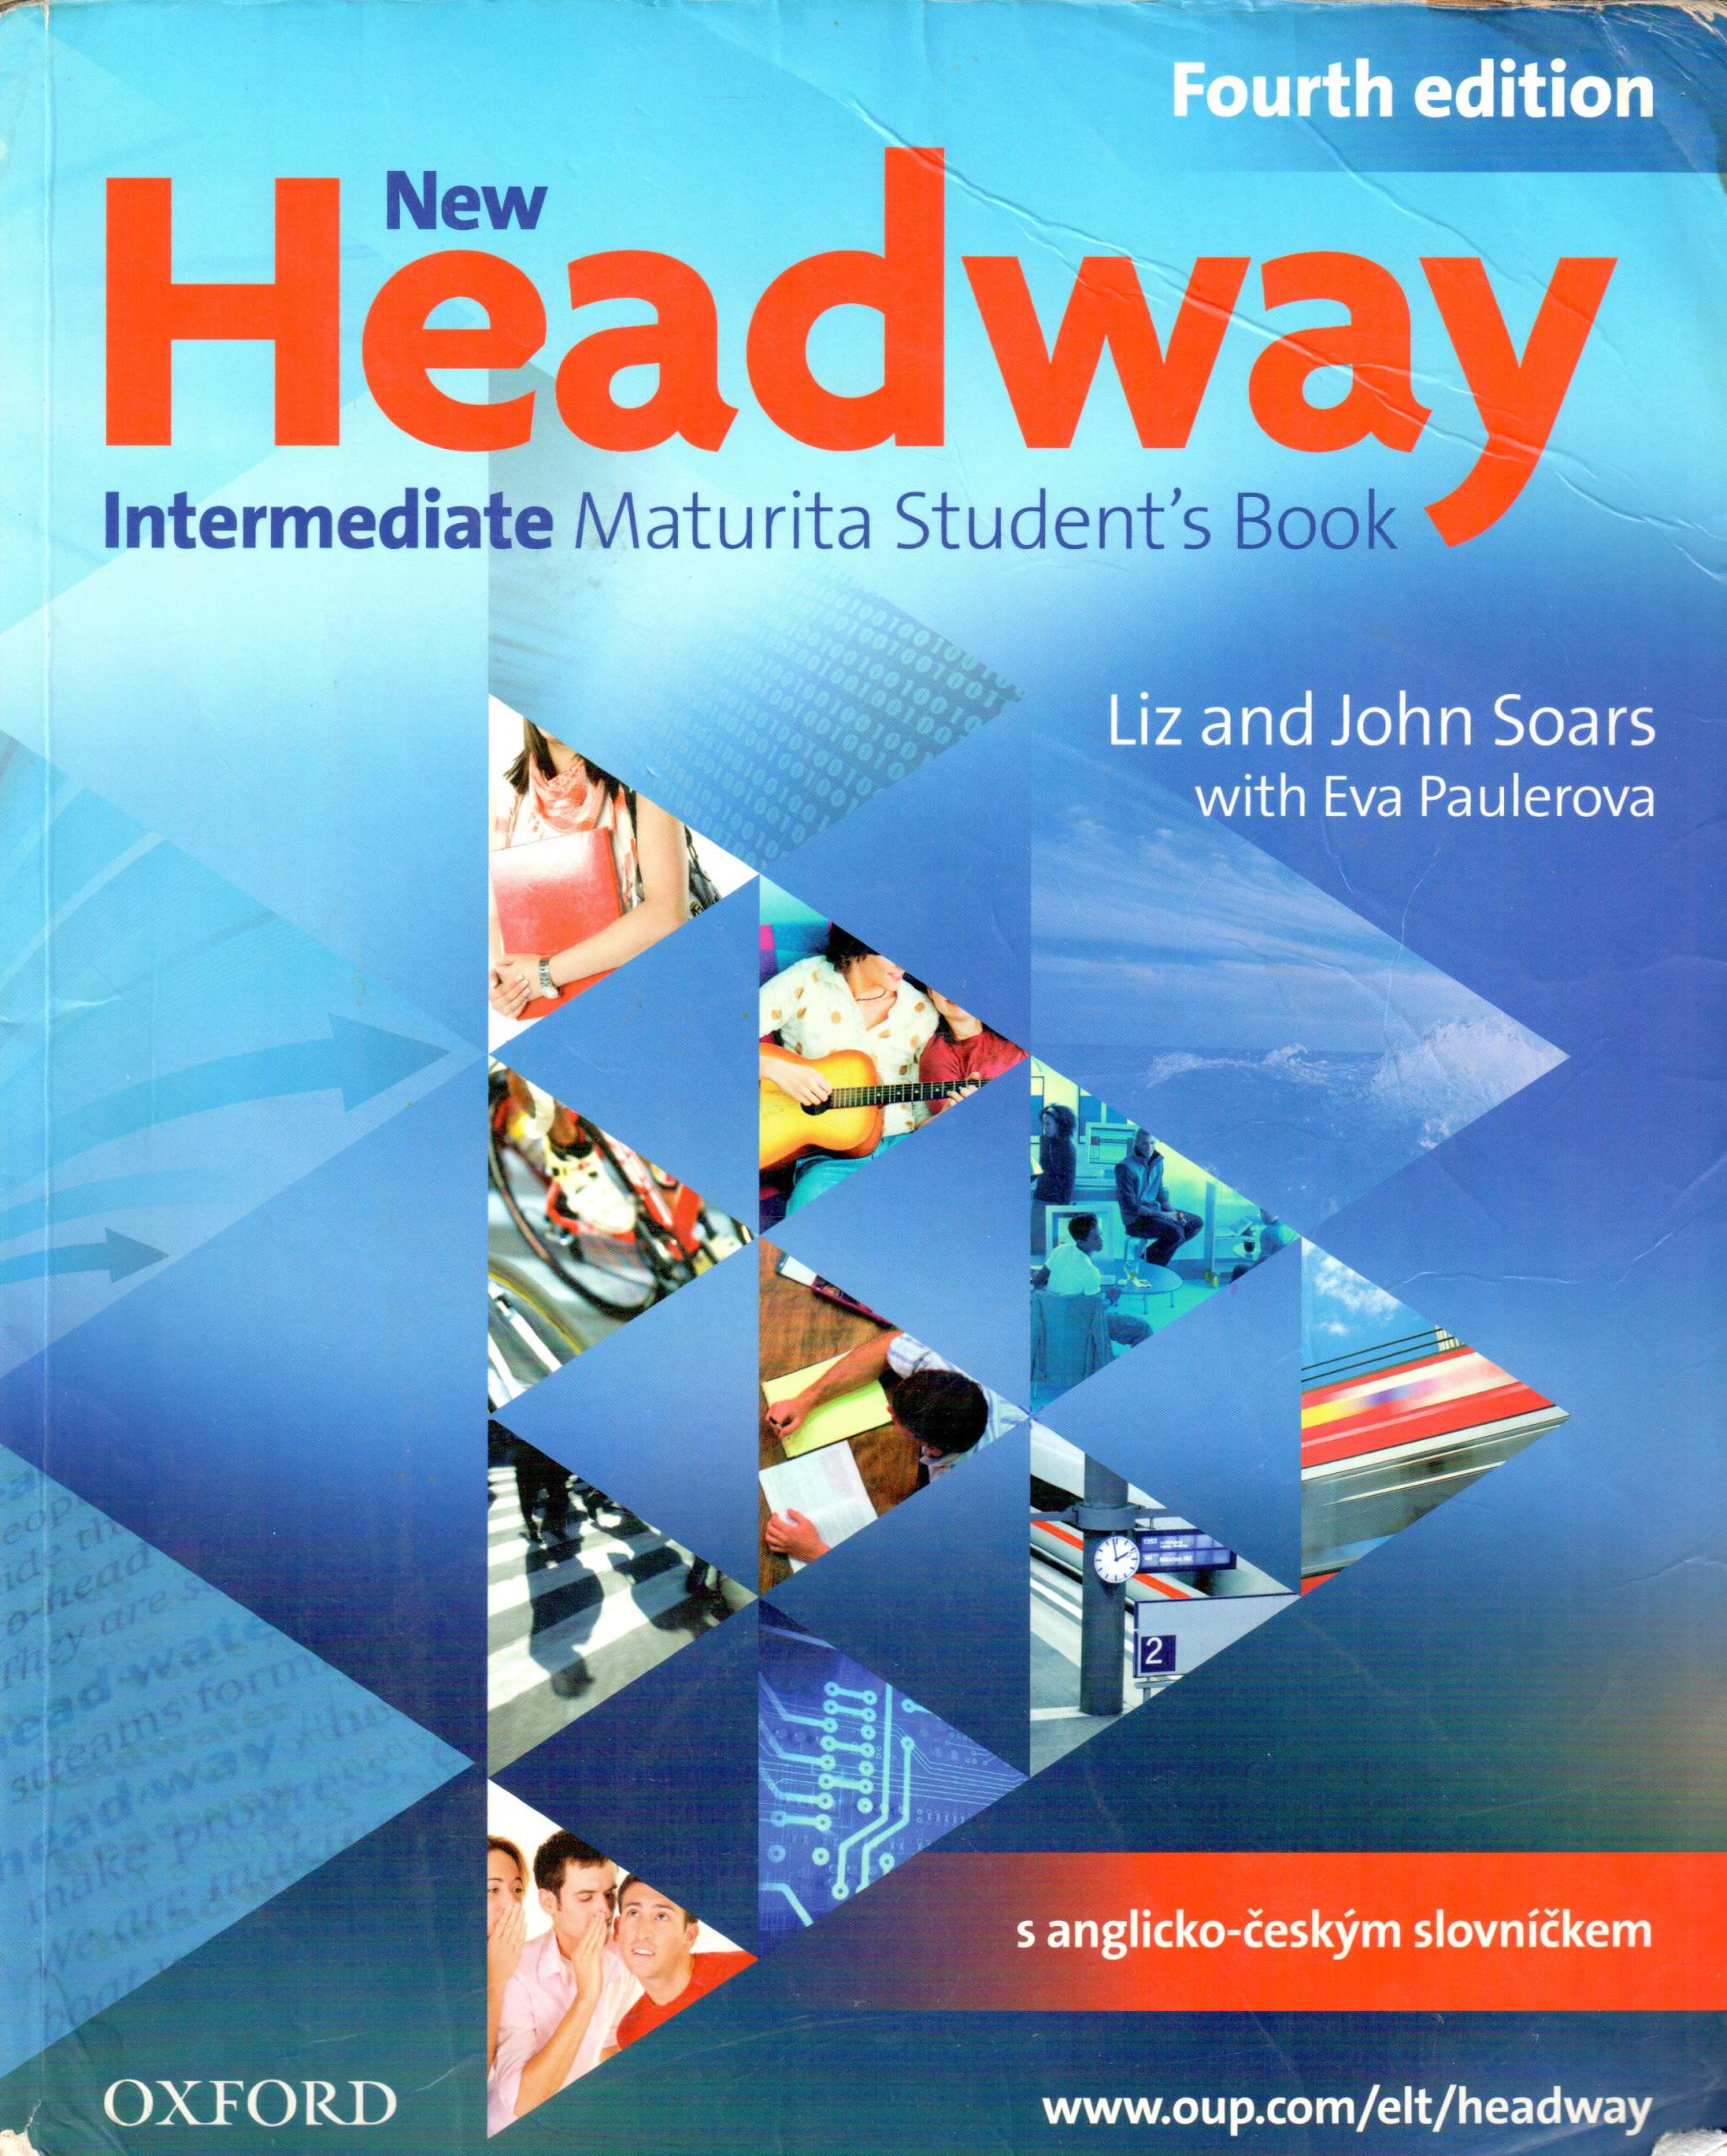 New Headway: Intermediate Maturita Student's Book - Náhled učebnice